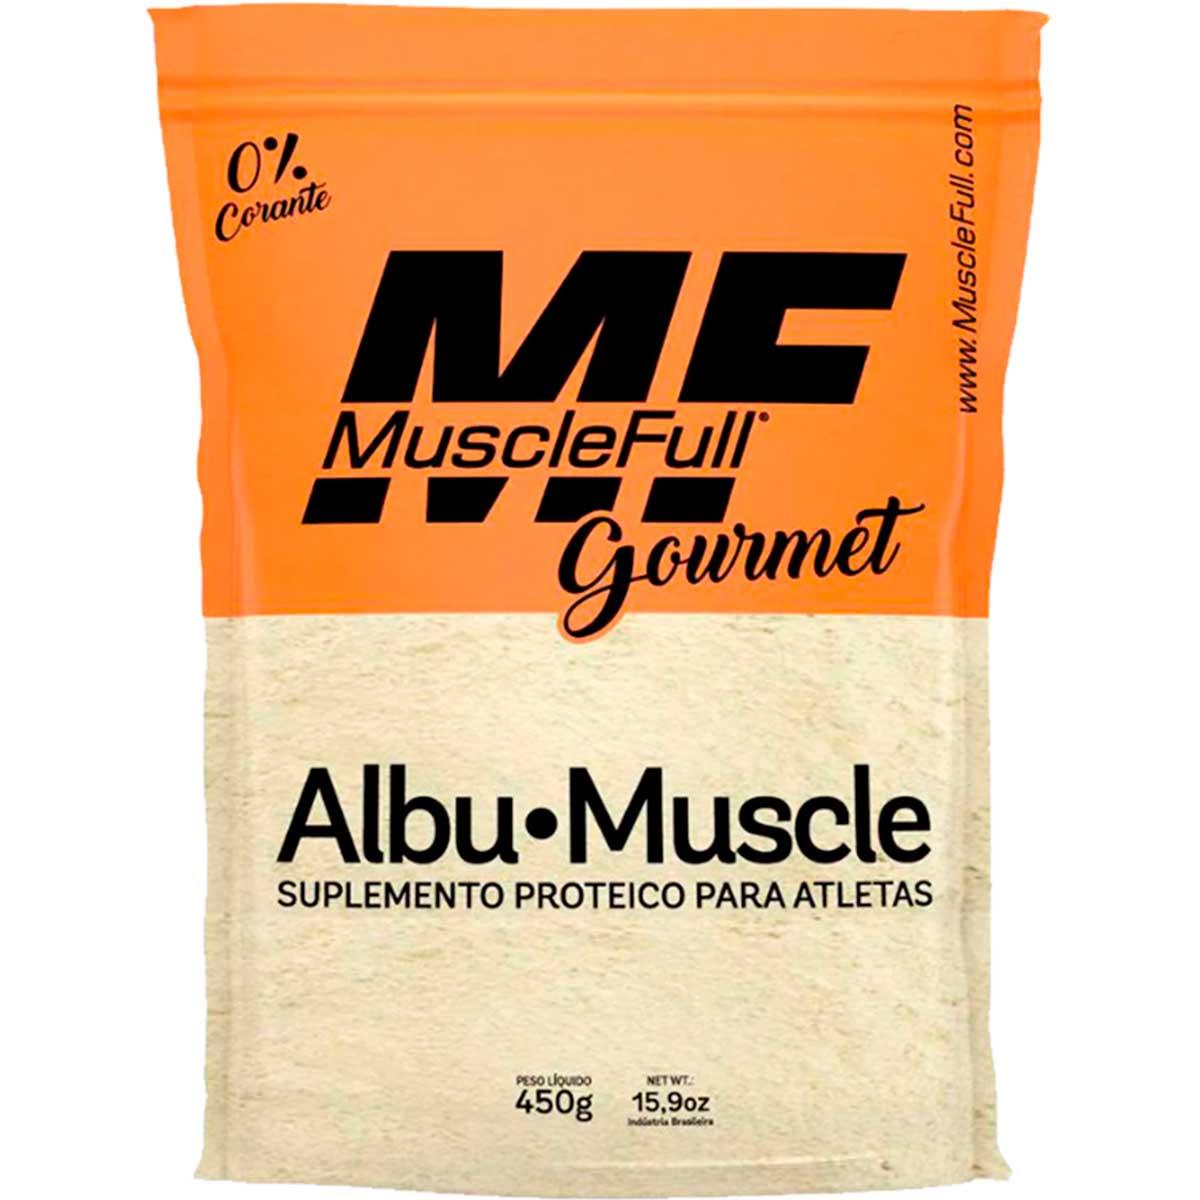 Albumina Albu-Muscle 450g - Muscle Full